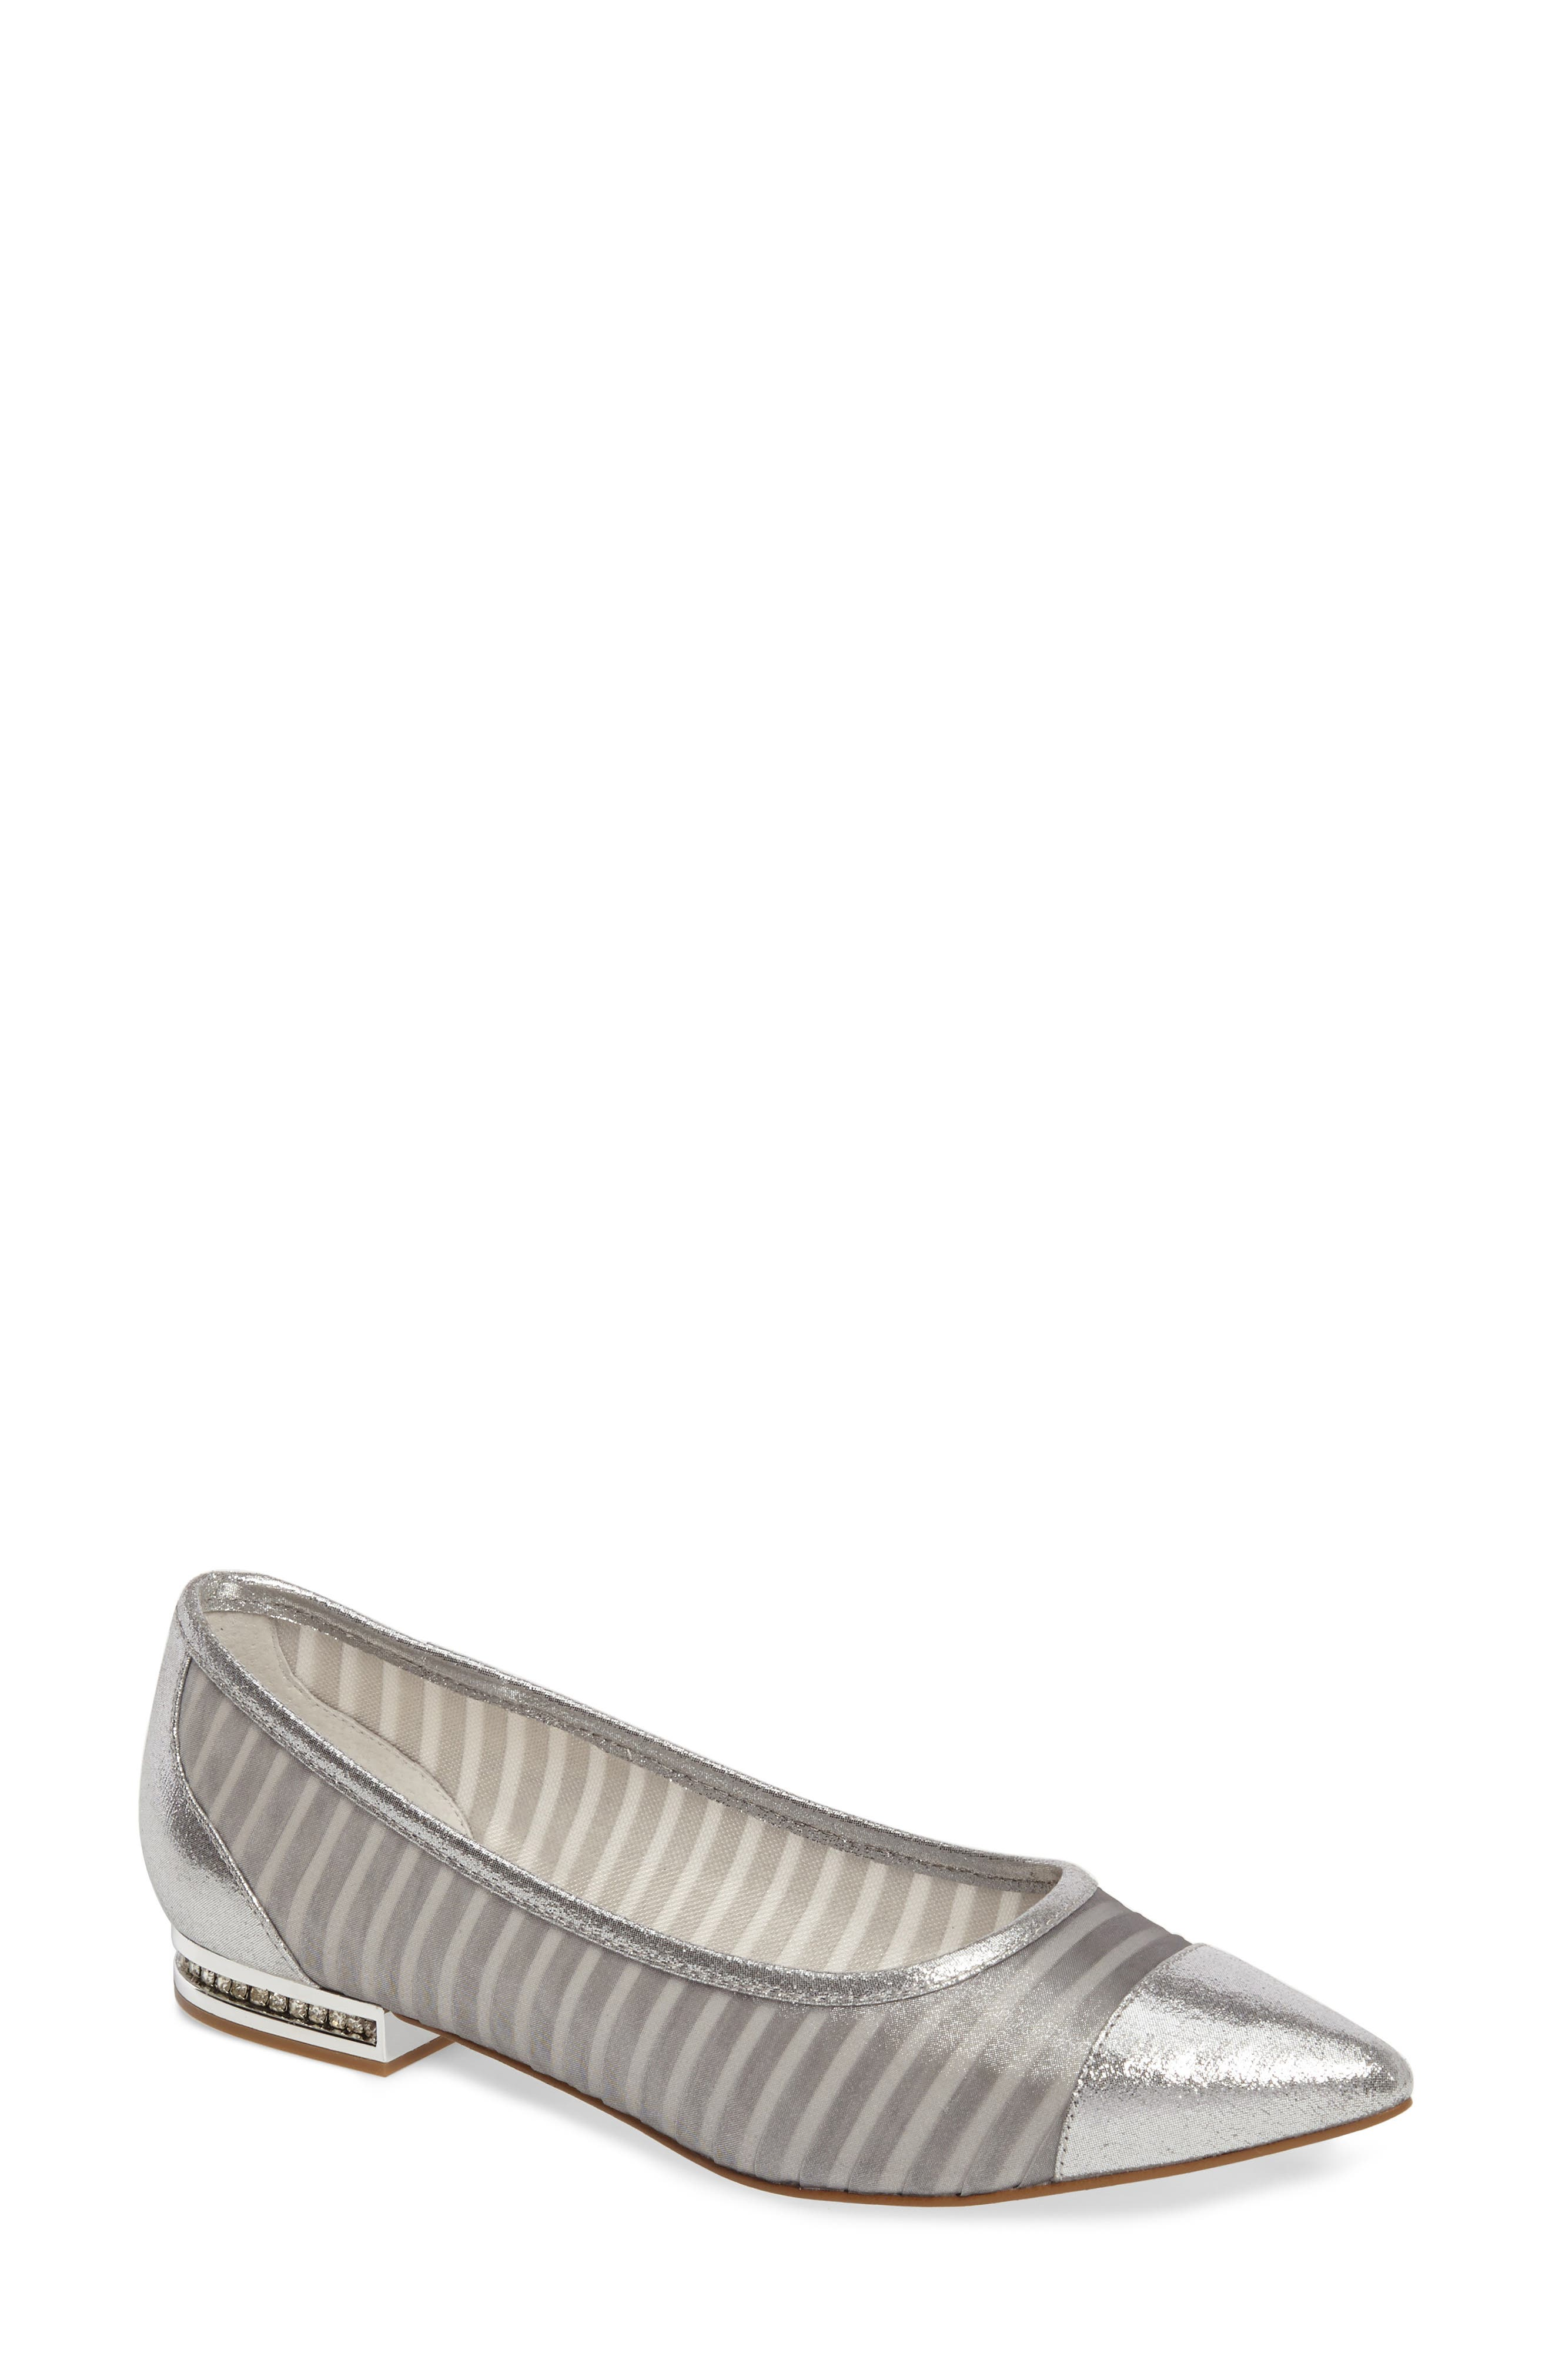 Tiffany Pointy Toe Flat,                             Main thumbnail 1, color,                             Silver Fabric